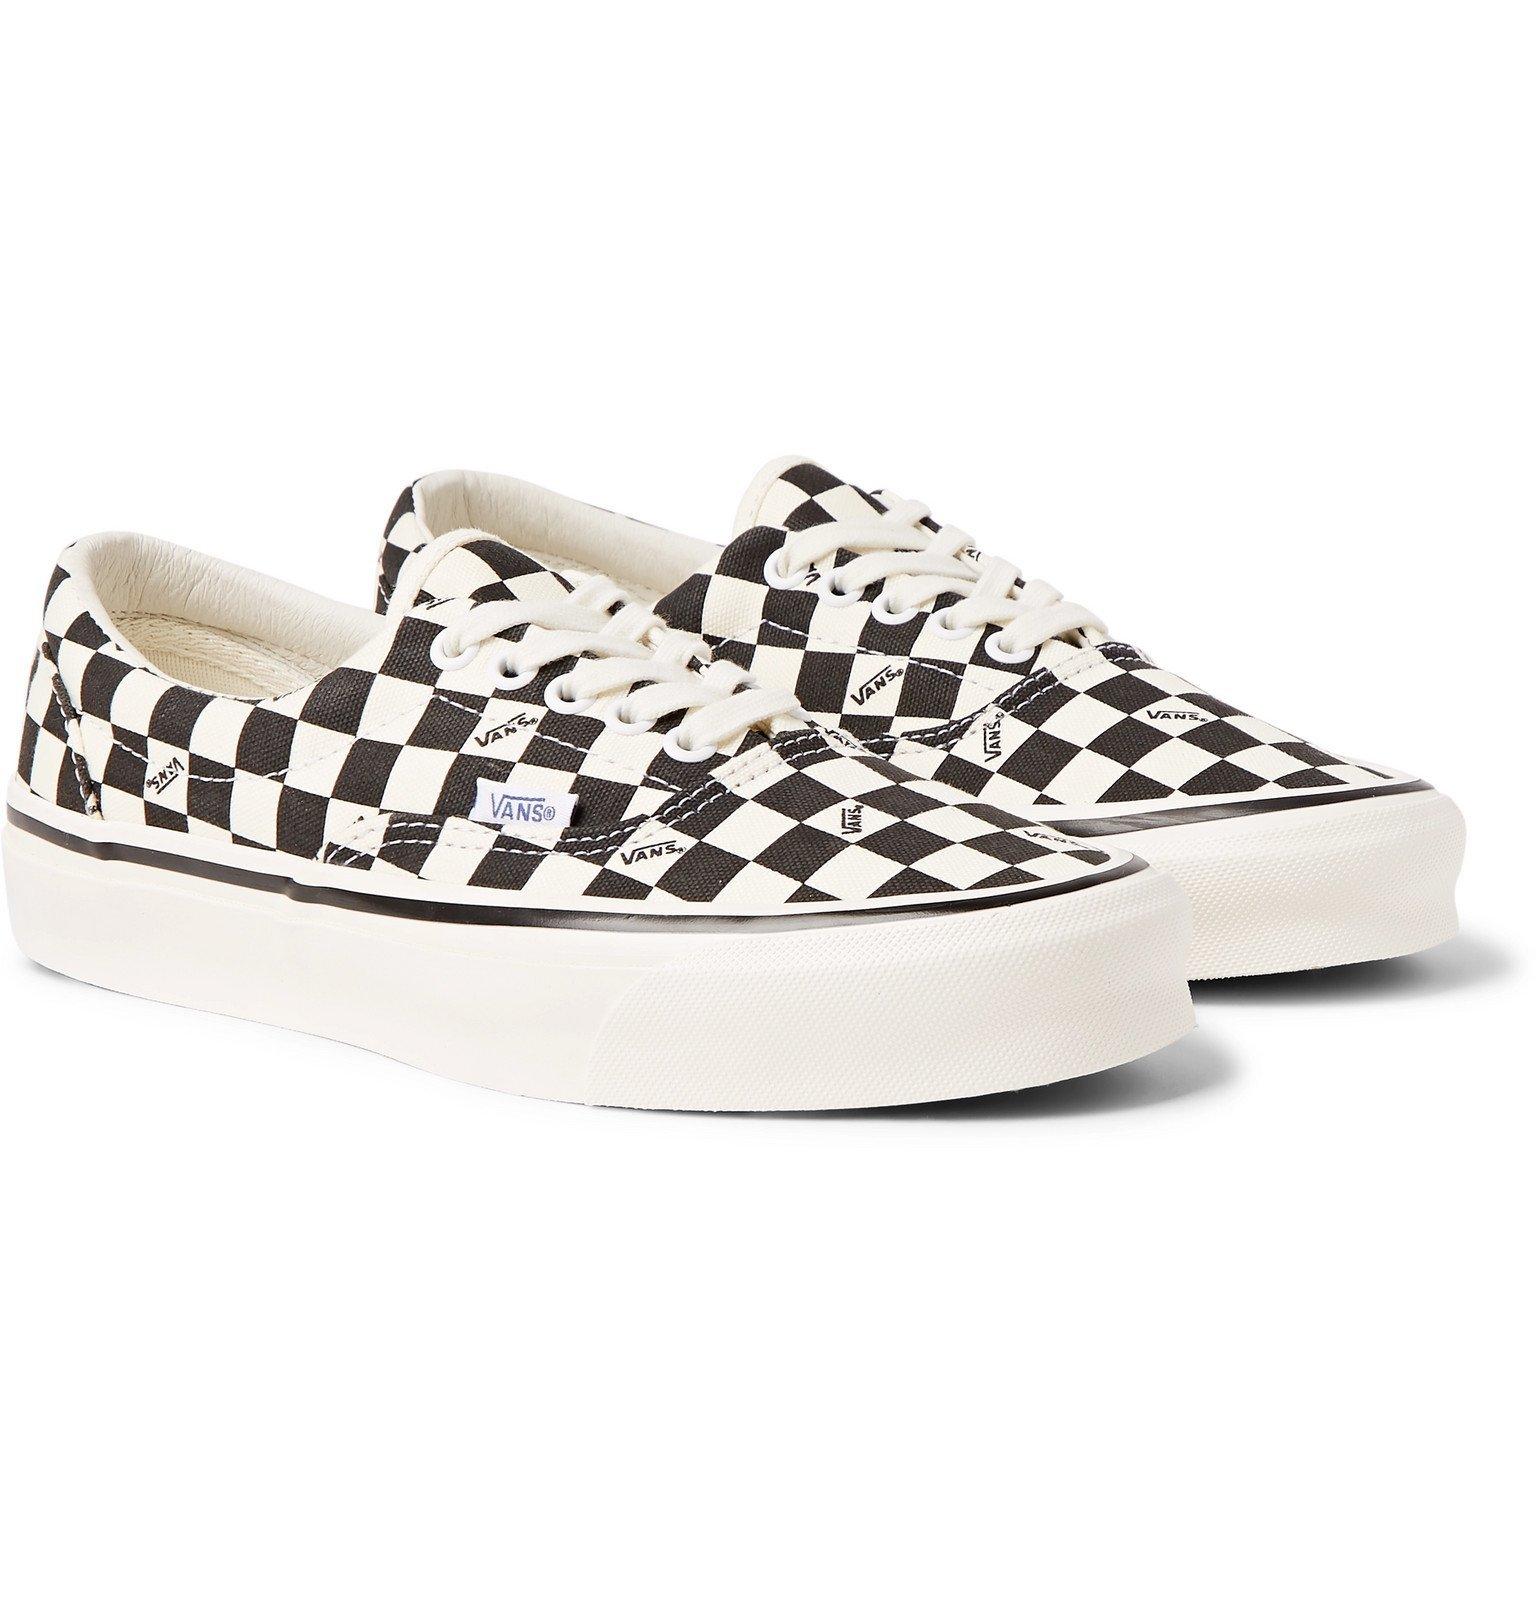 Vans - OG Era LX Checkerboard Canvas